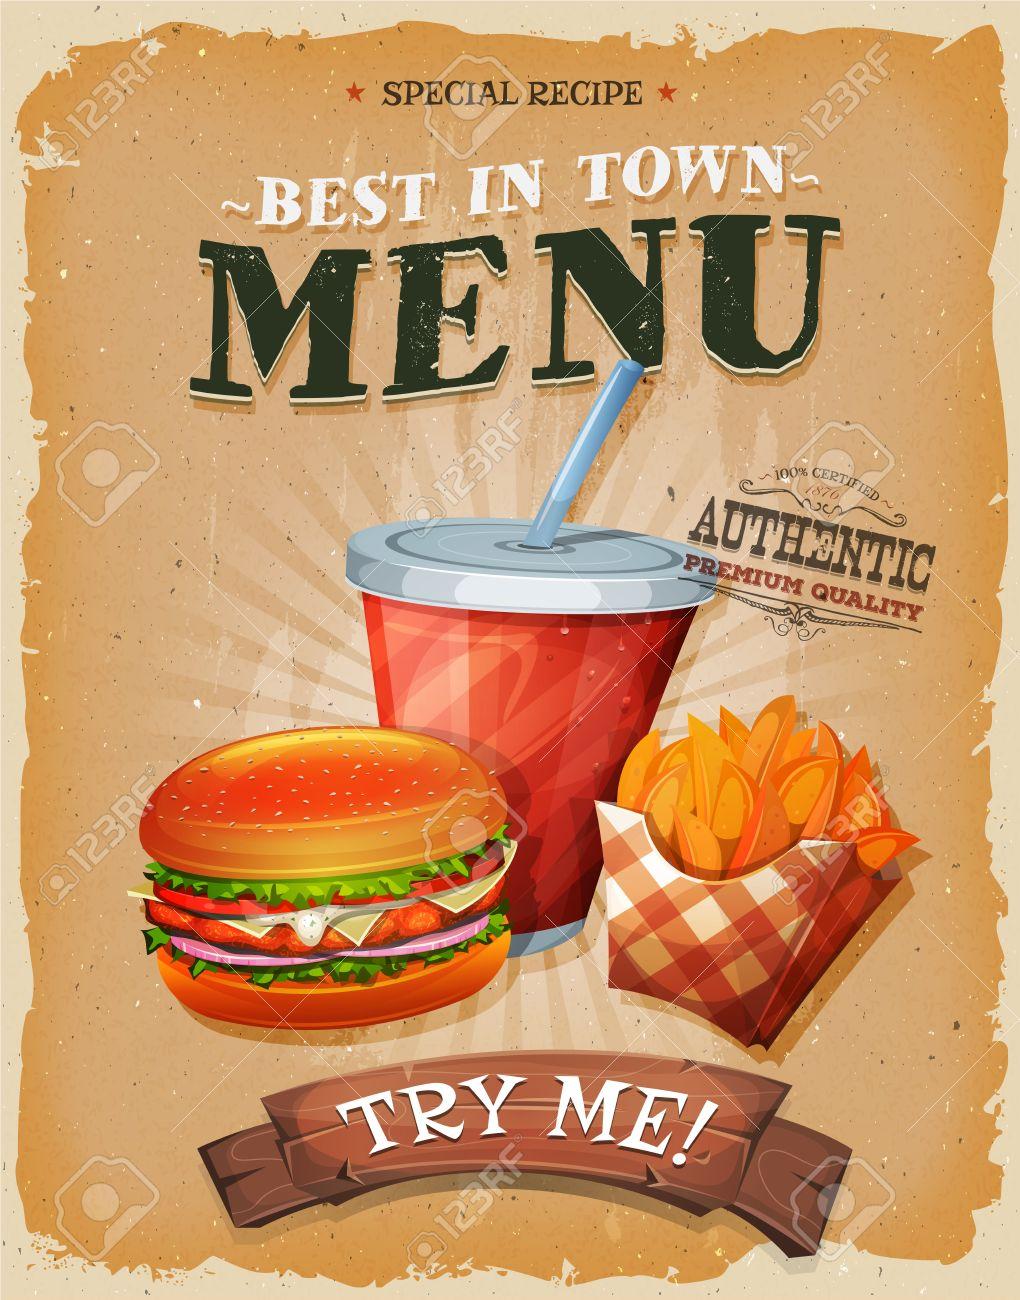 Poster design vintage - Illustration Of A Design Vintage And Grunge Textured Poster With Burger Cup Of Soda